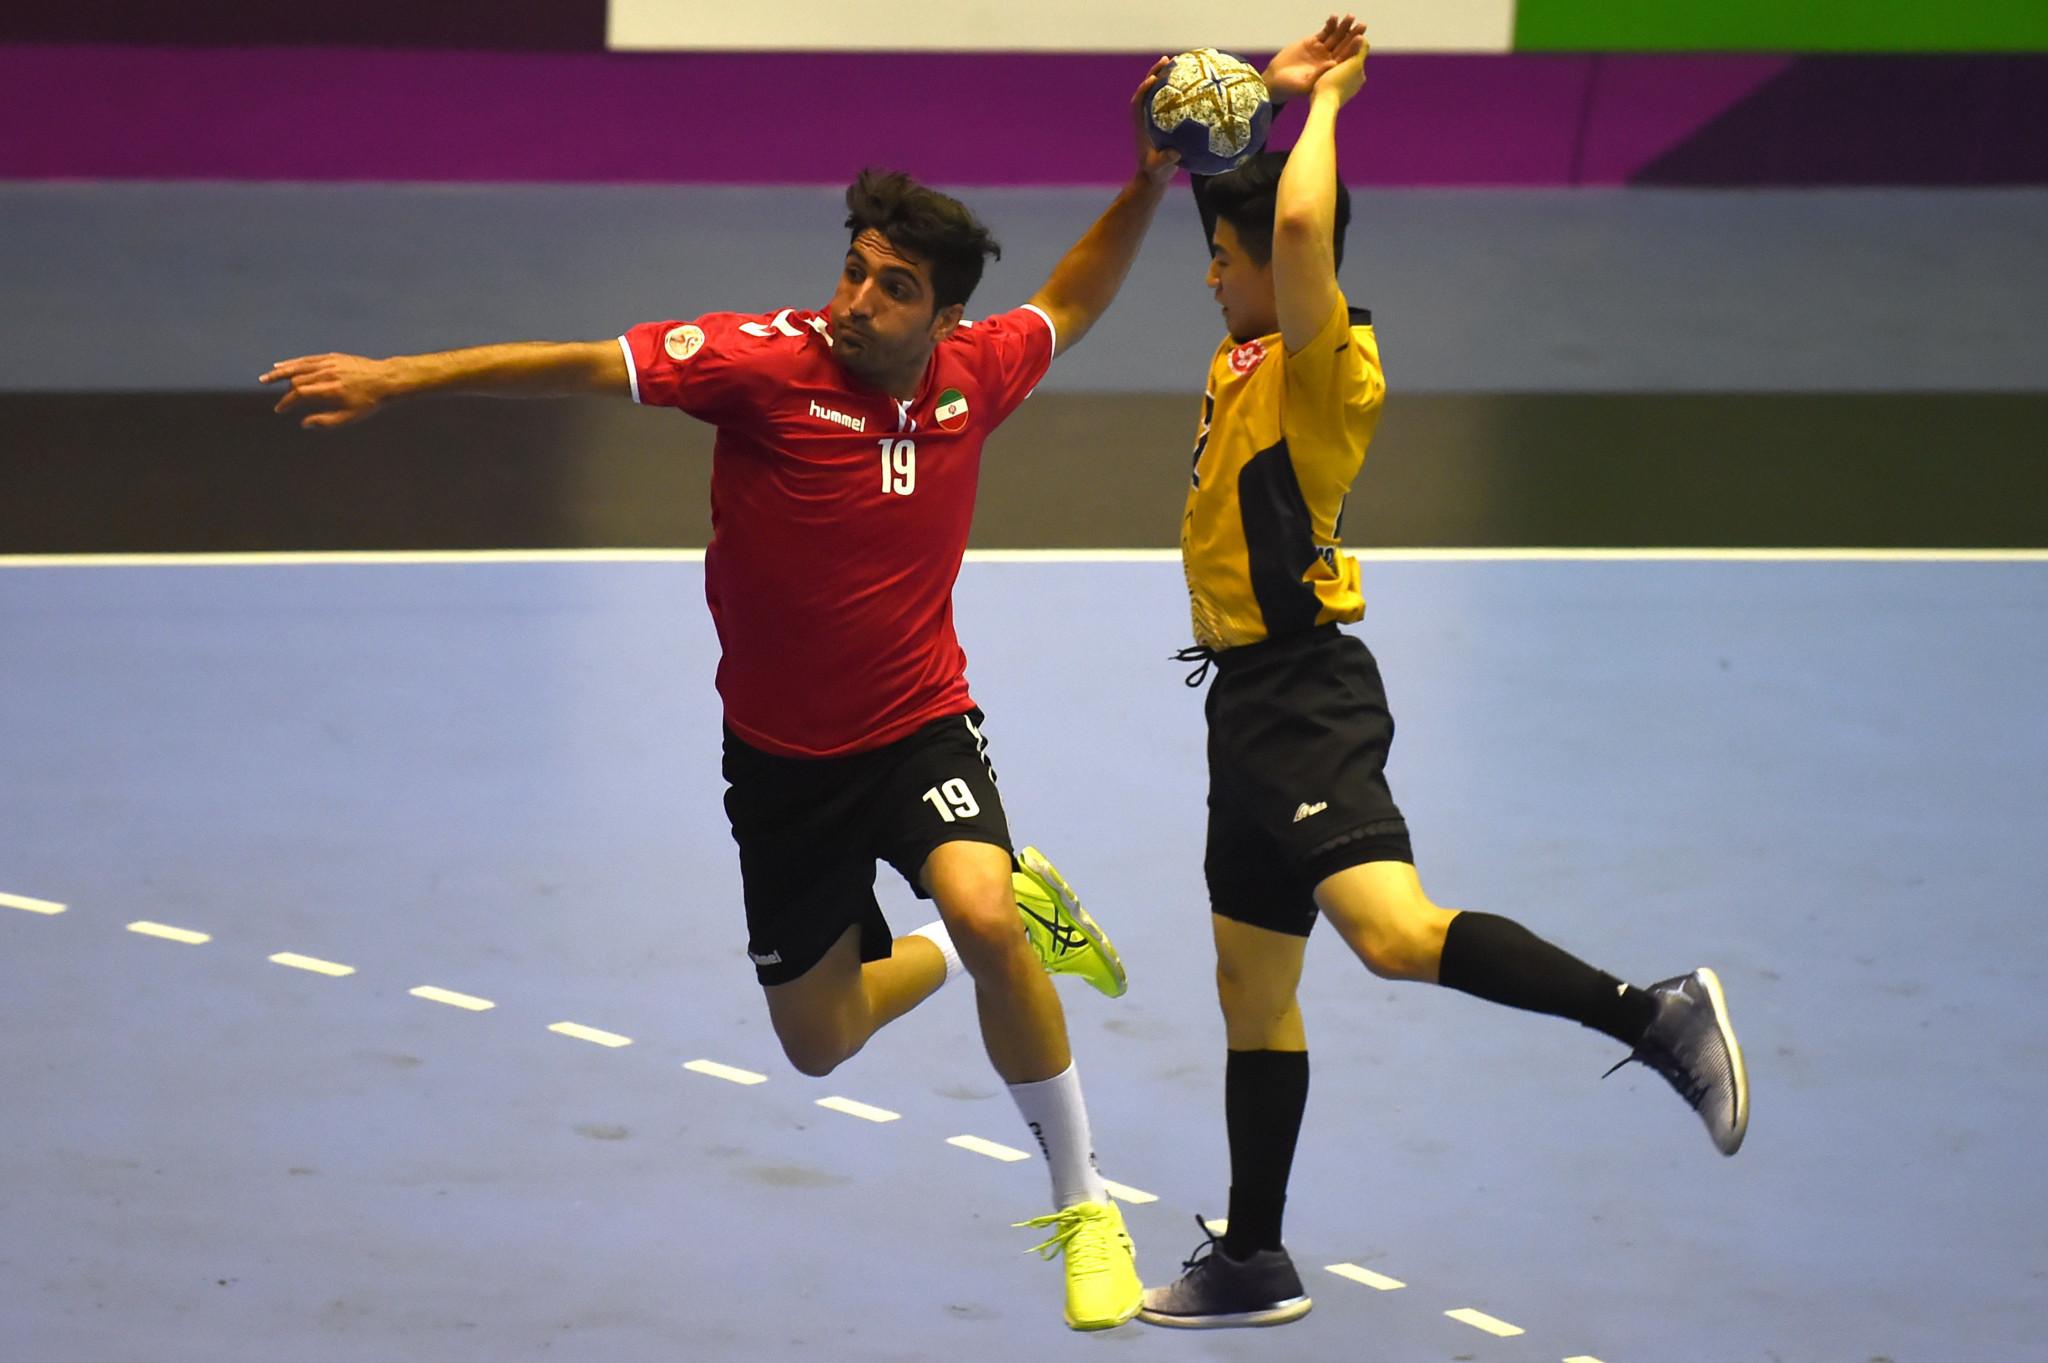 Iran to remain host of Asian Men's Junior Handball Championship despite COVID-19 concerns